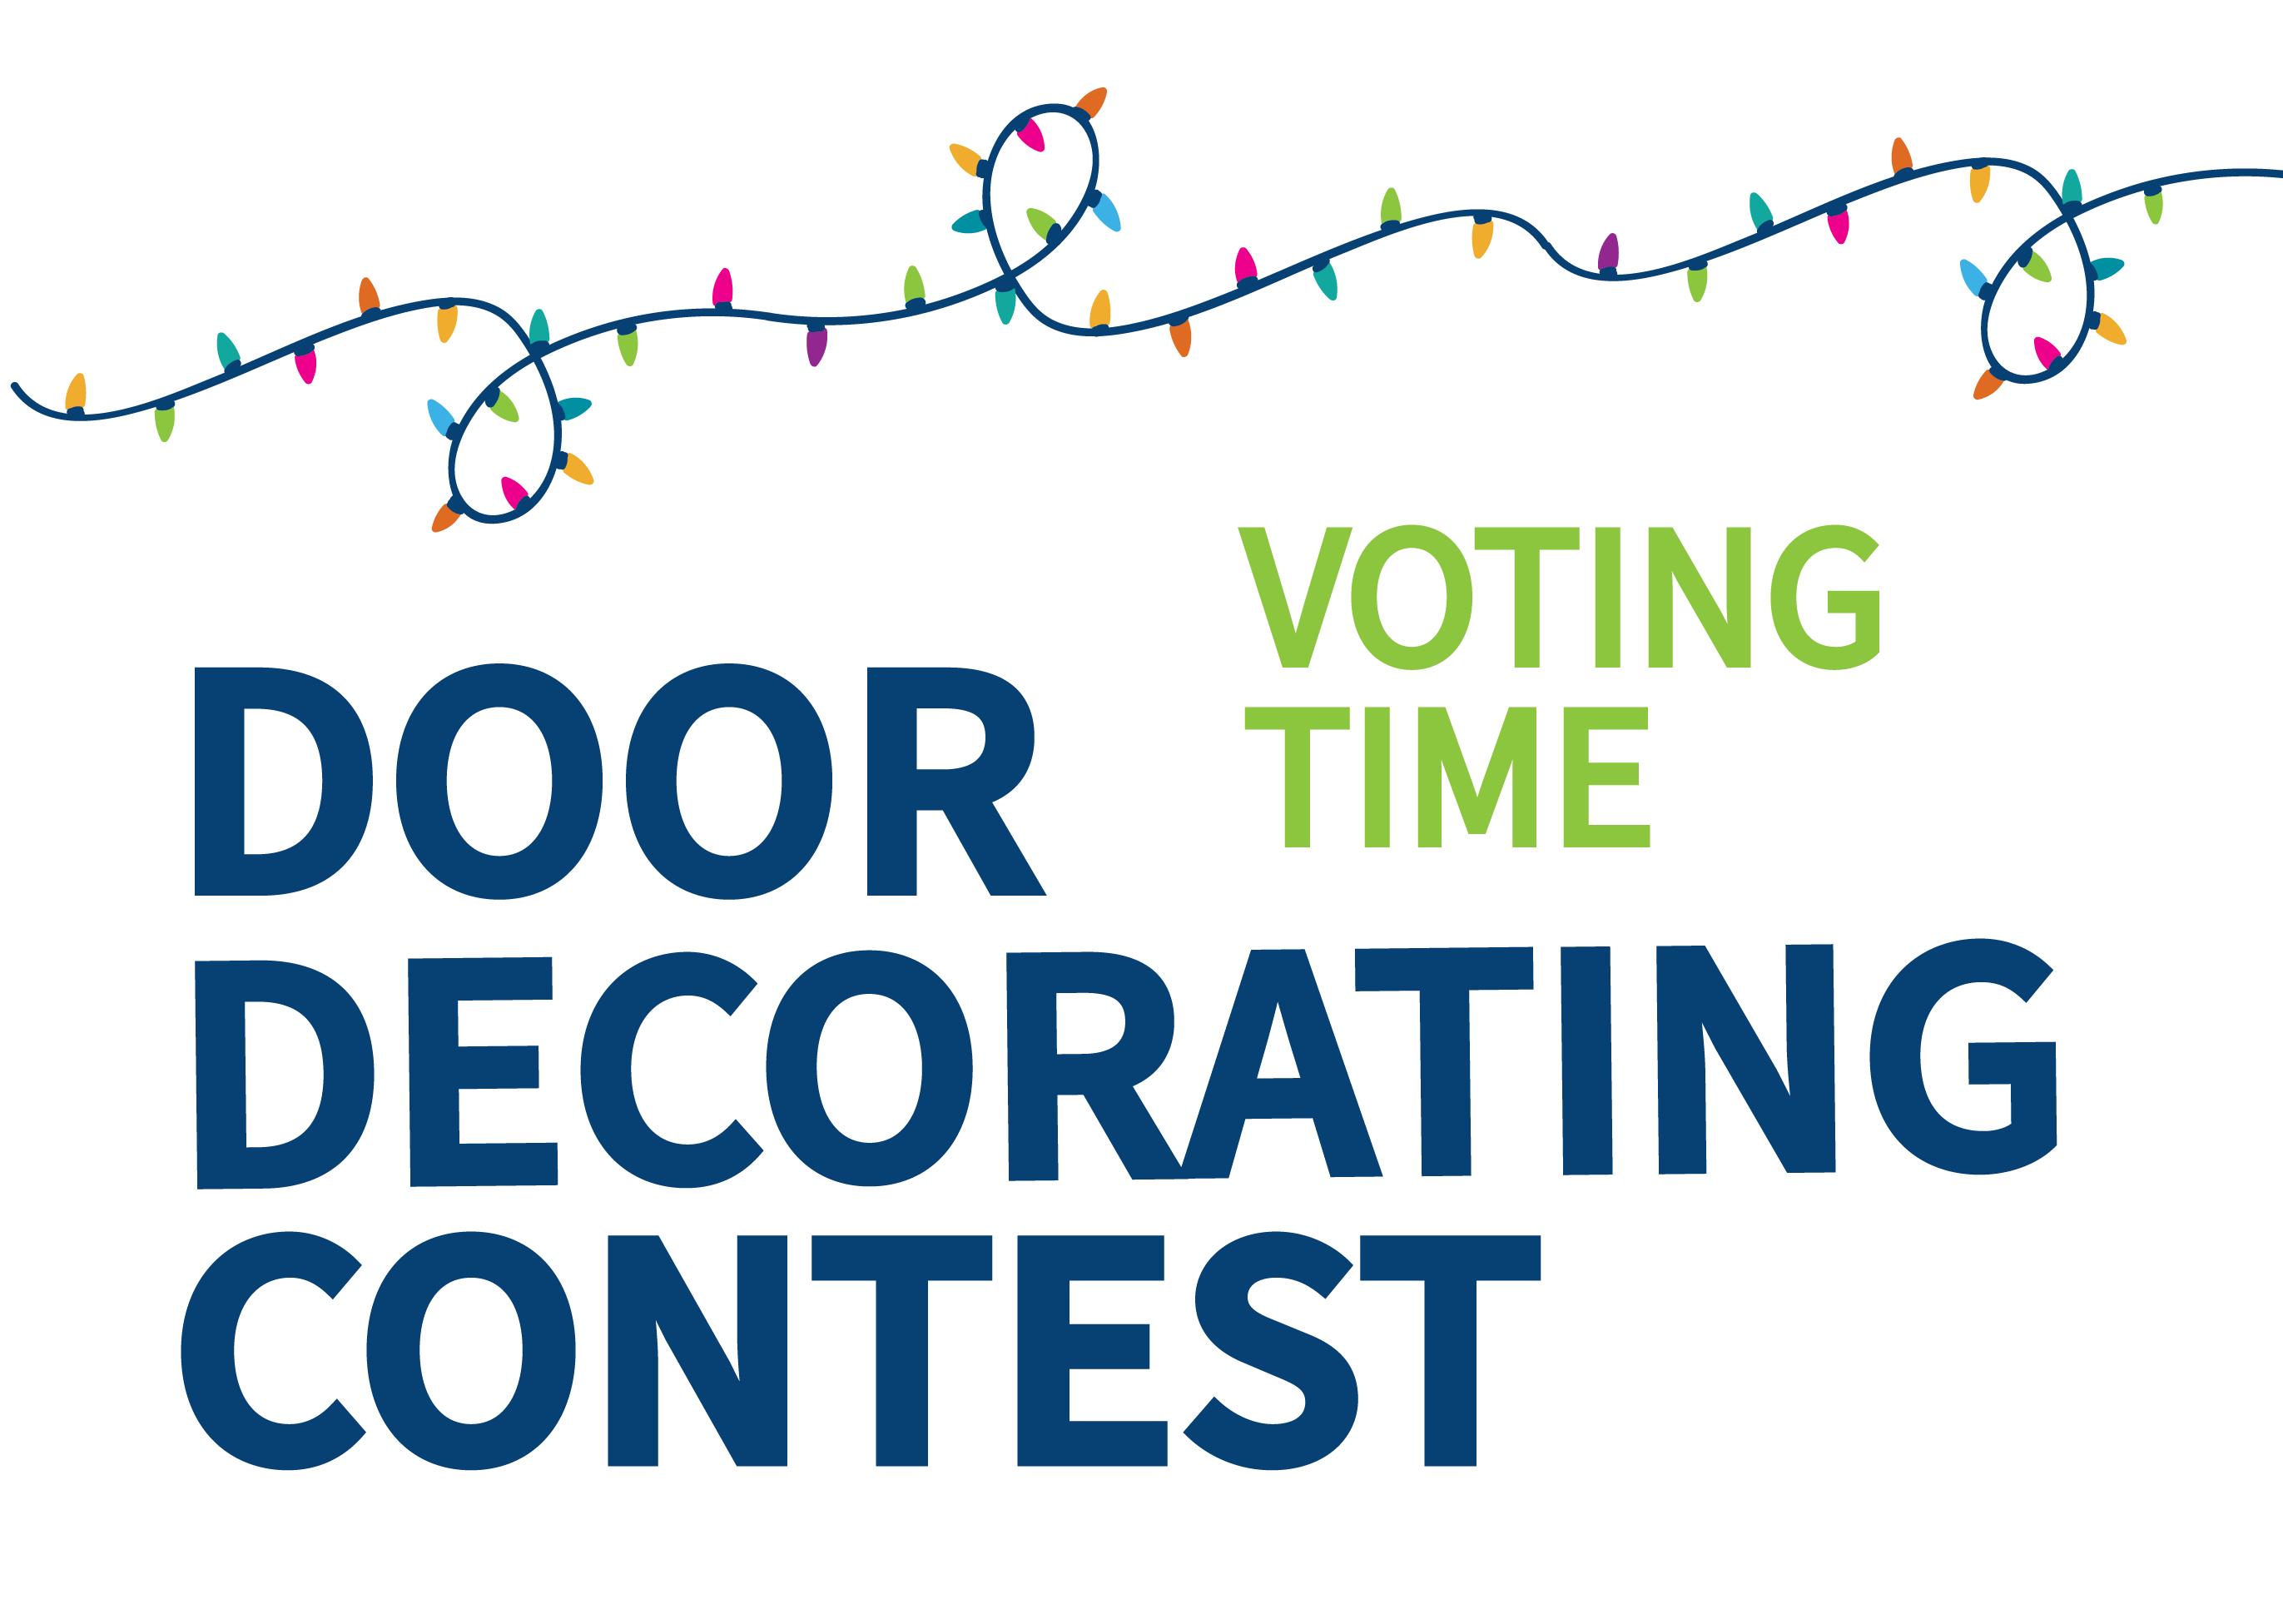 Door Decorating Contest Icon